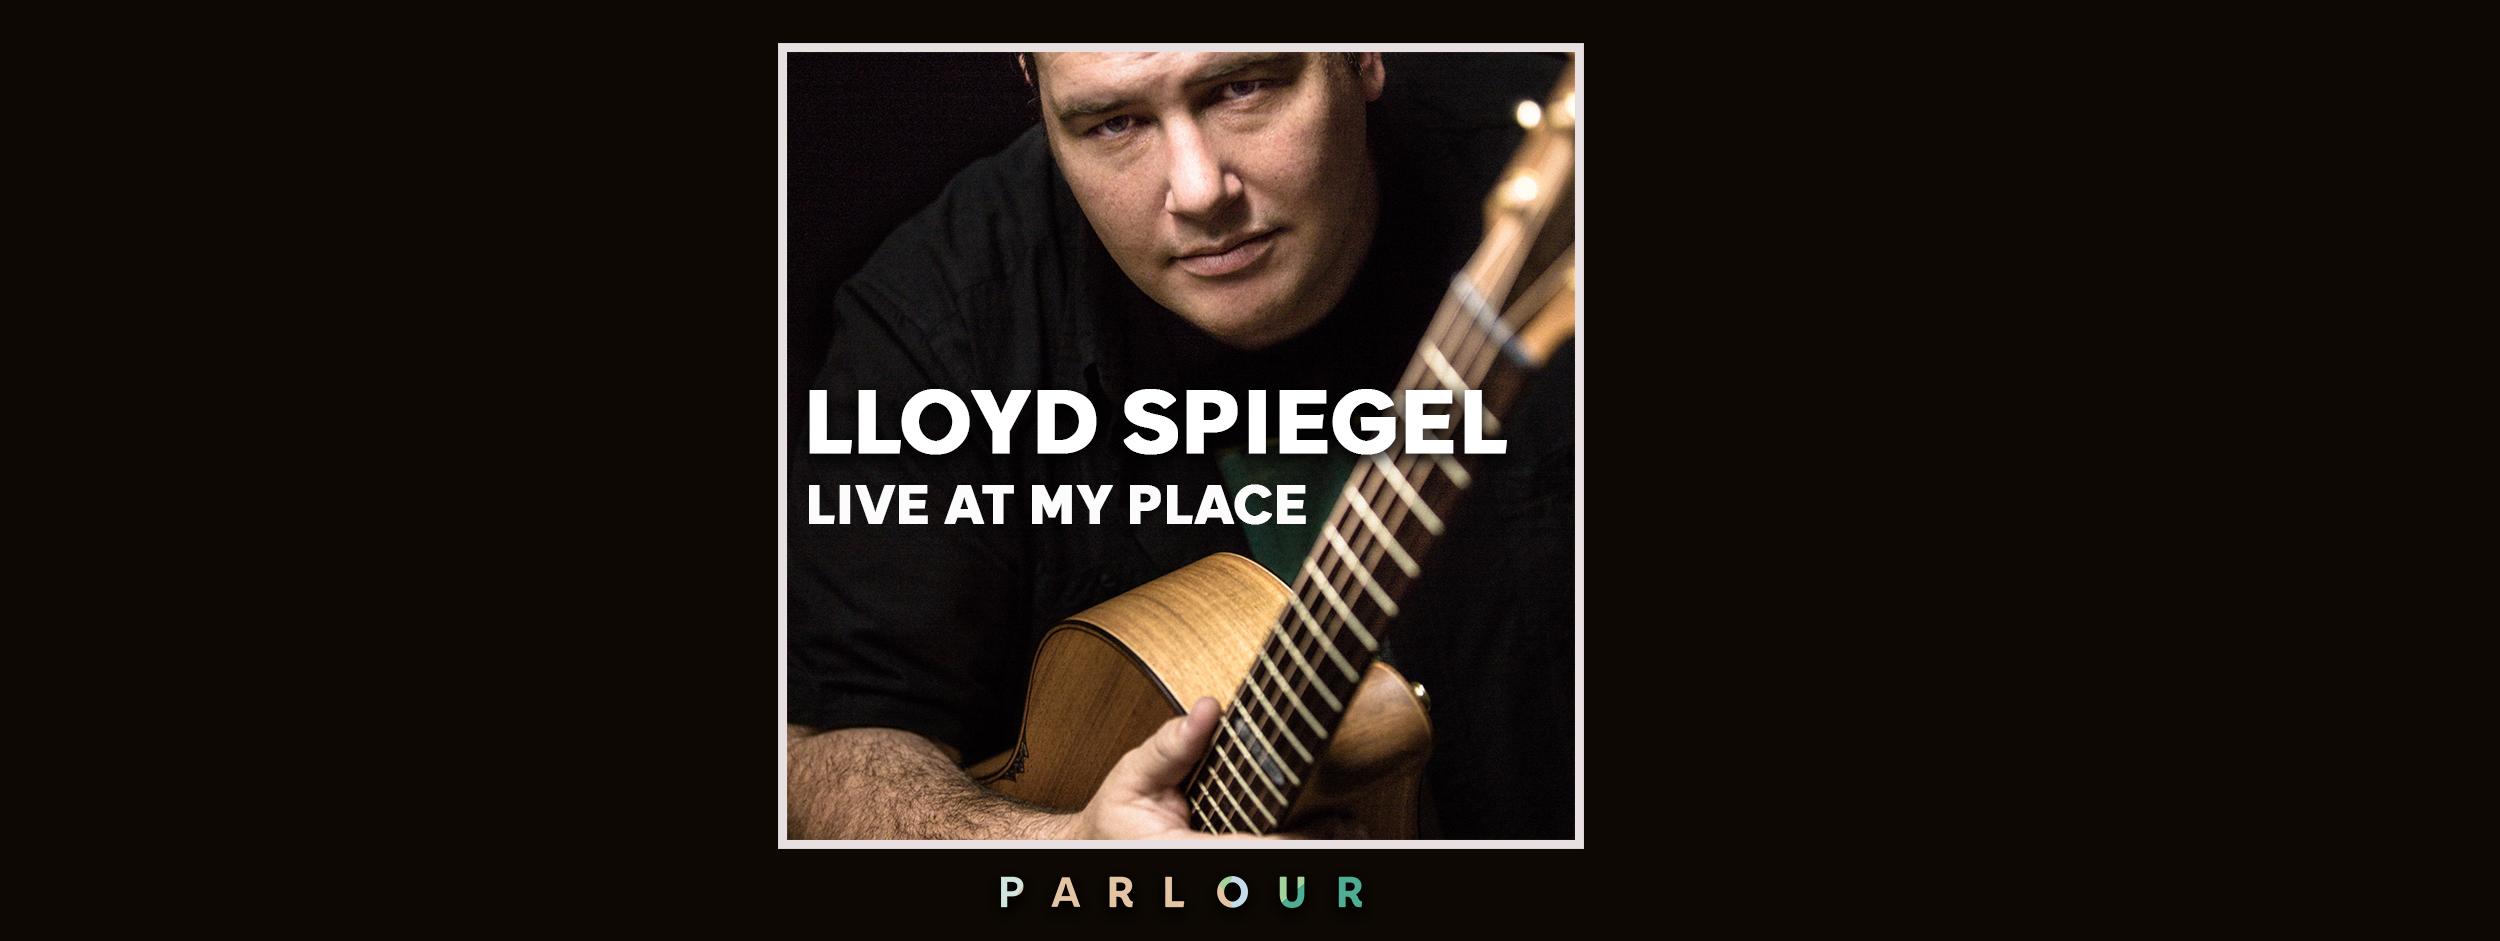 Lloyd Spiegel Banner.jpg